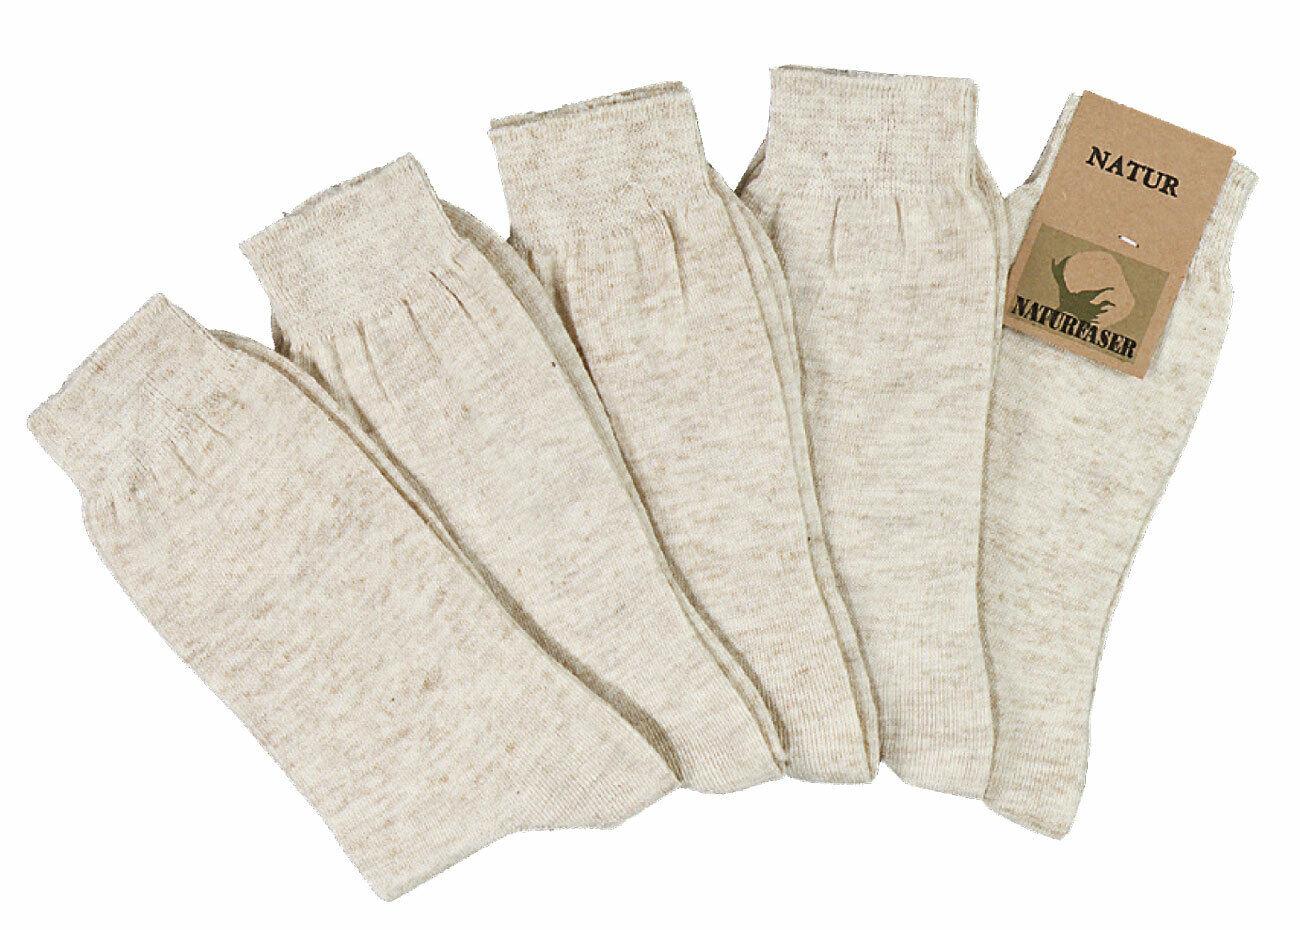 Damen Herren Strümpfe Socken mit Leinen 5-er oder 10er-Pack Natur meliert